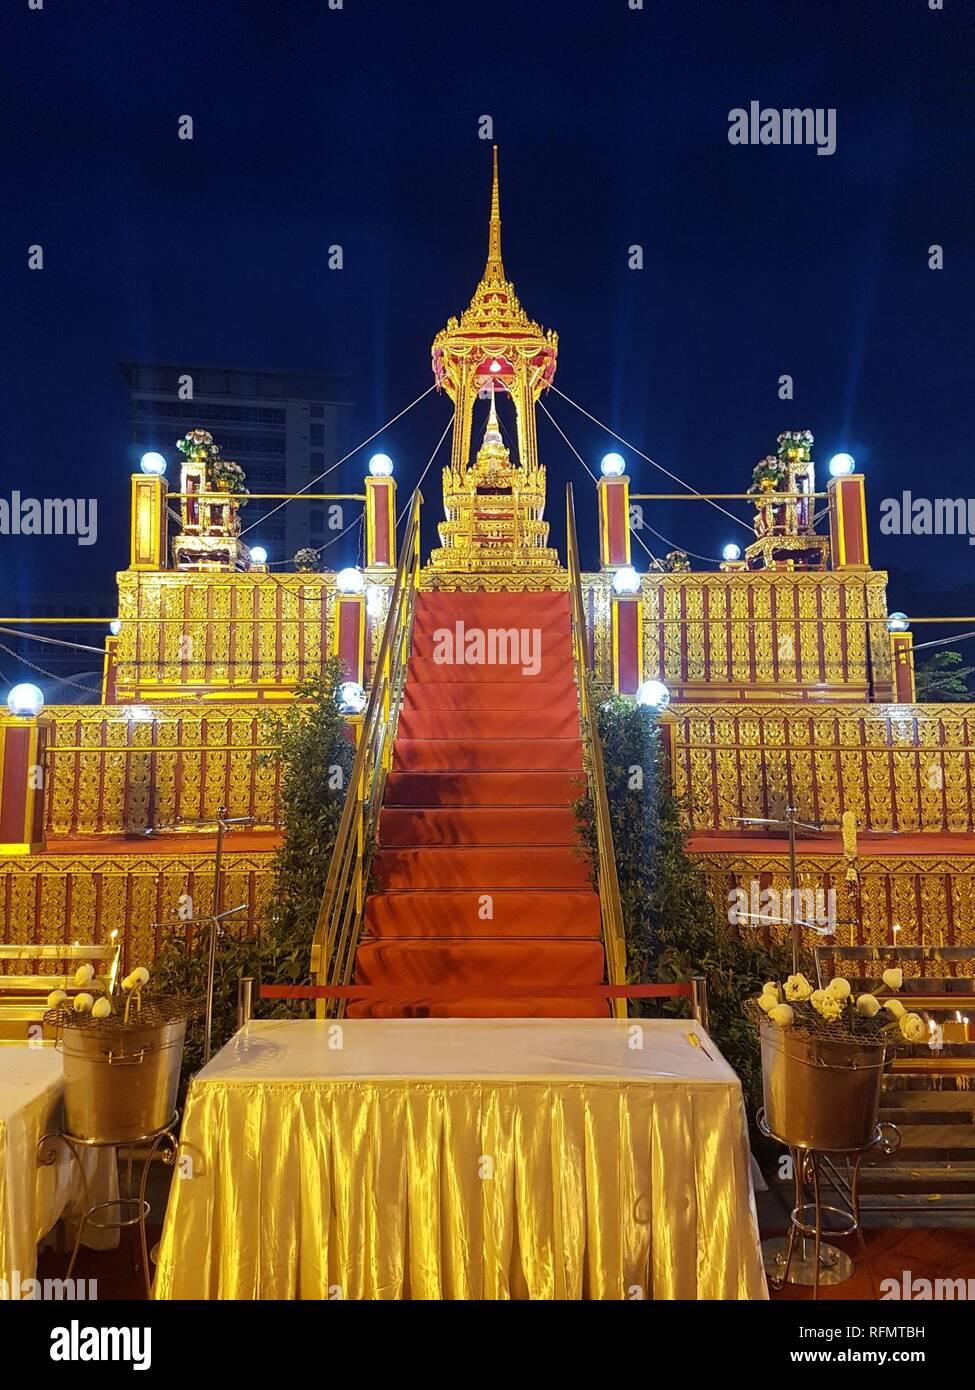 Bangkok Vesak - 2017-05-07 (001). - Stock Image